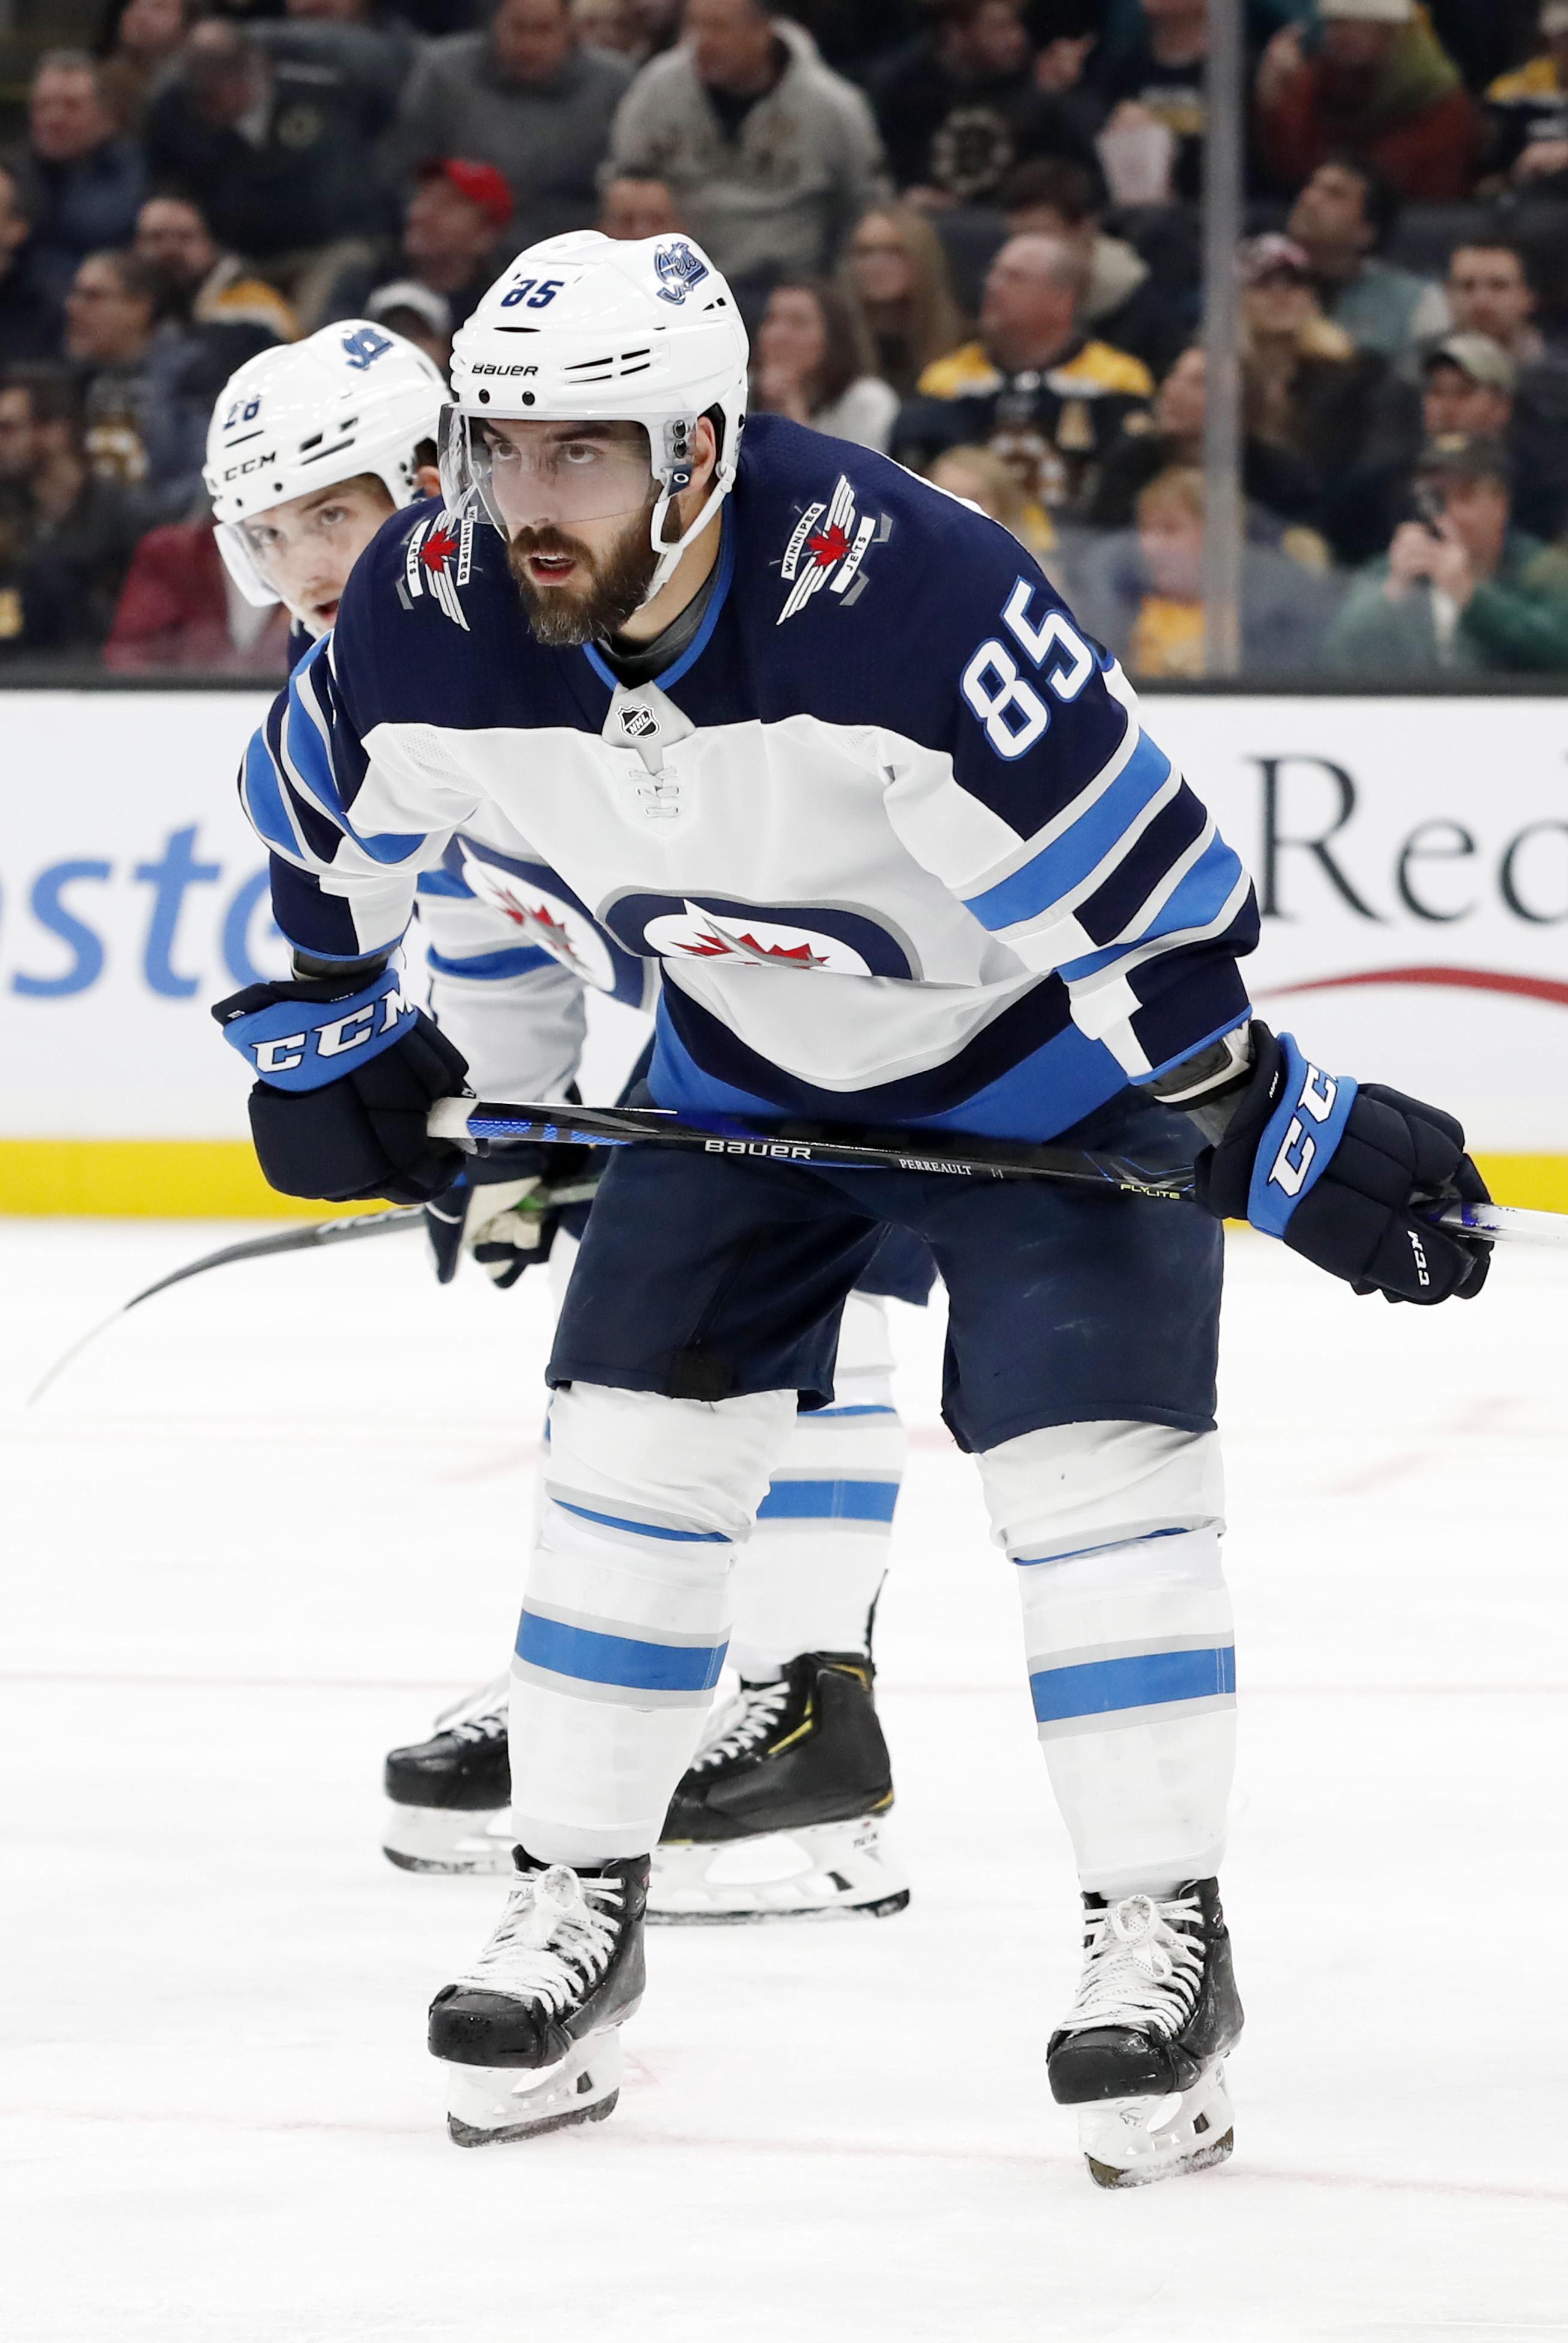 NHL: JAN 09 Jets at Bruins